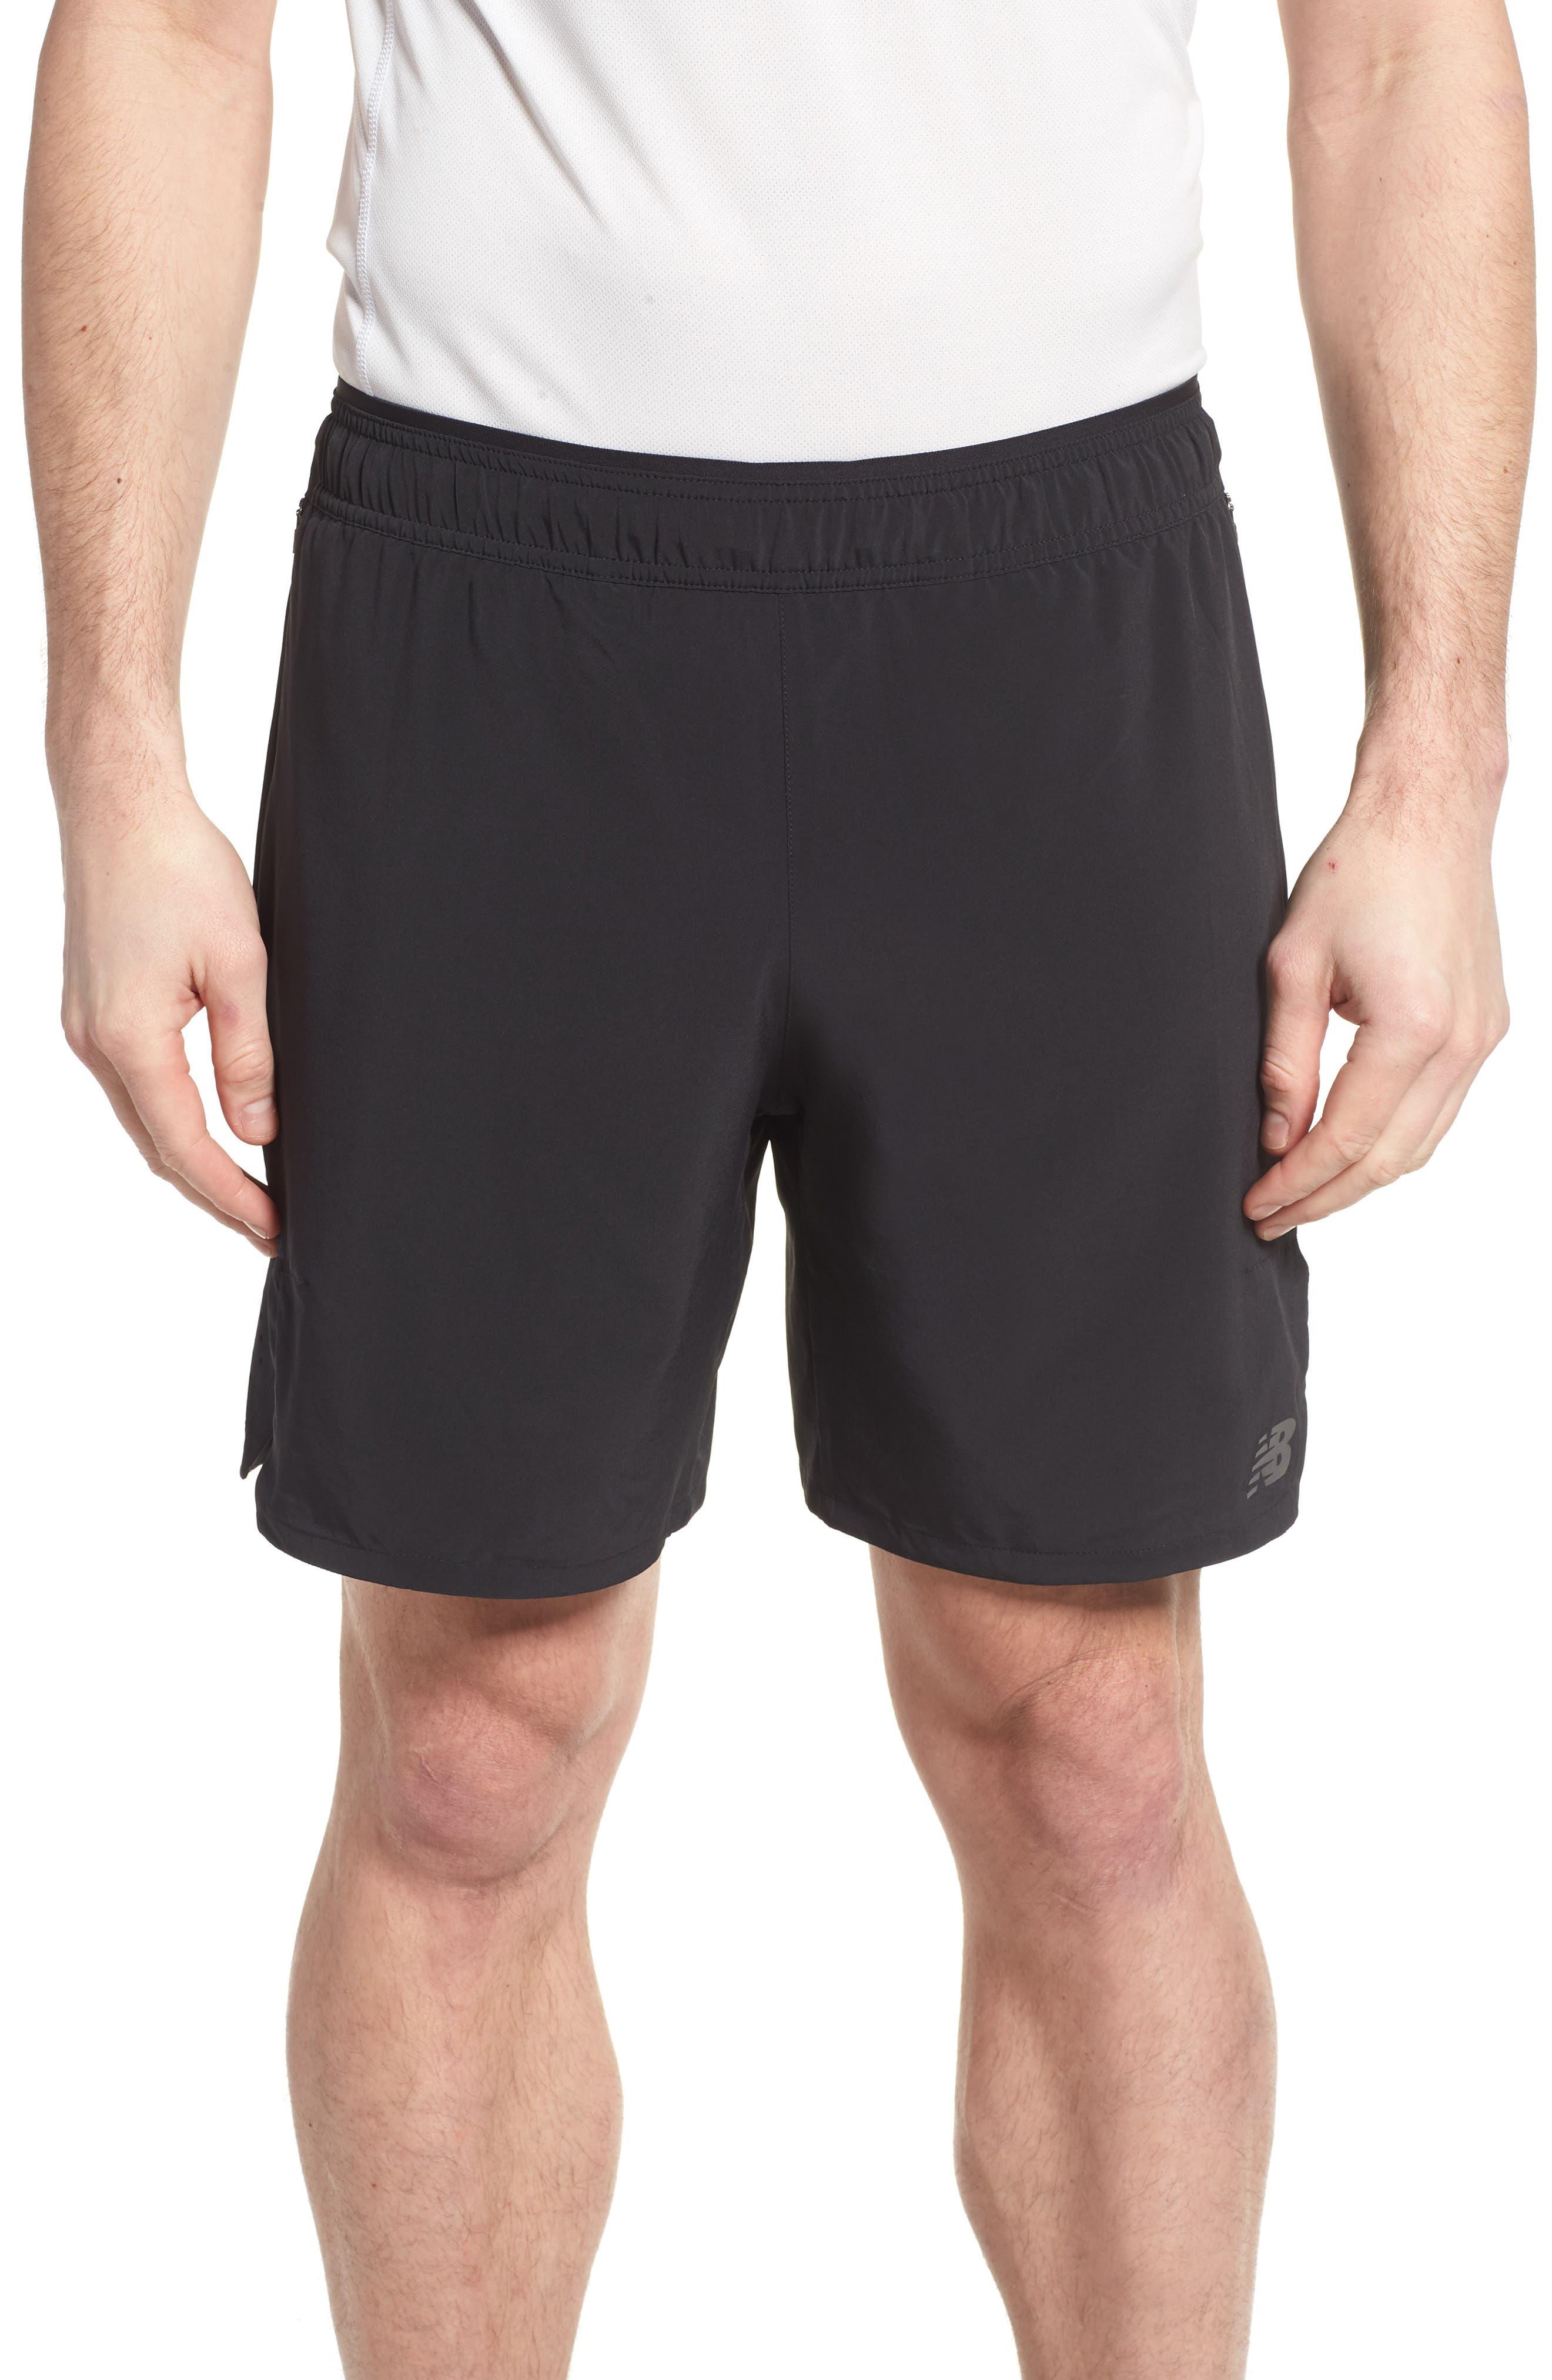 Transform 2-in-1 Shorts,                             Main thumbnail 1, color,                             BLACK